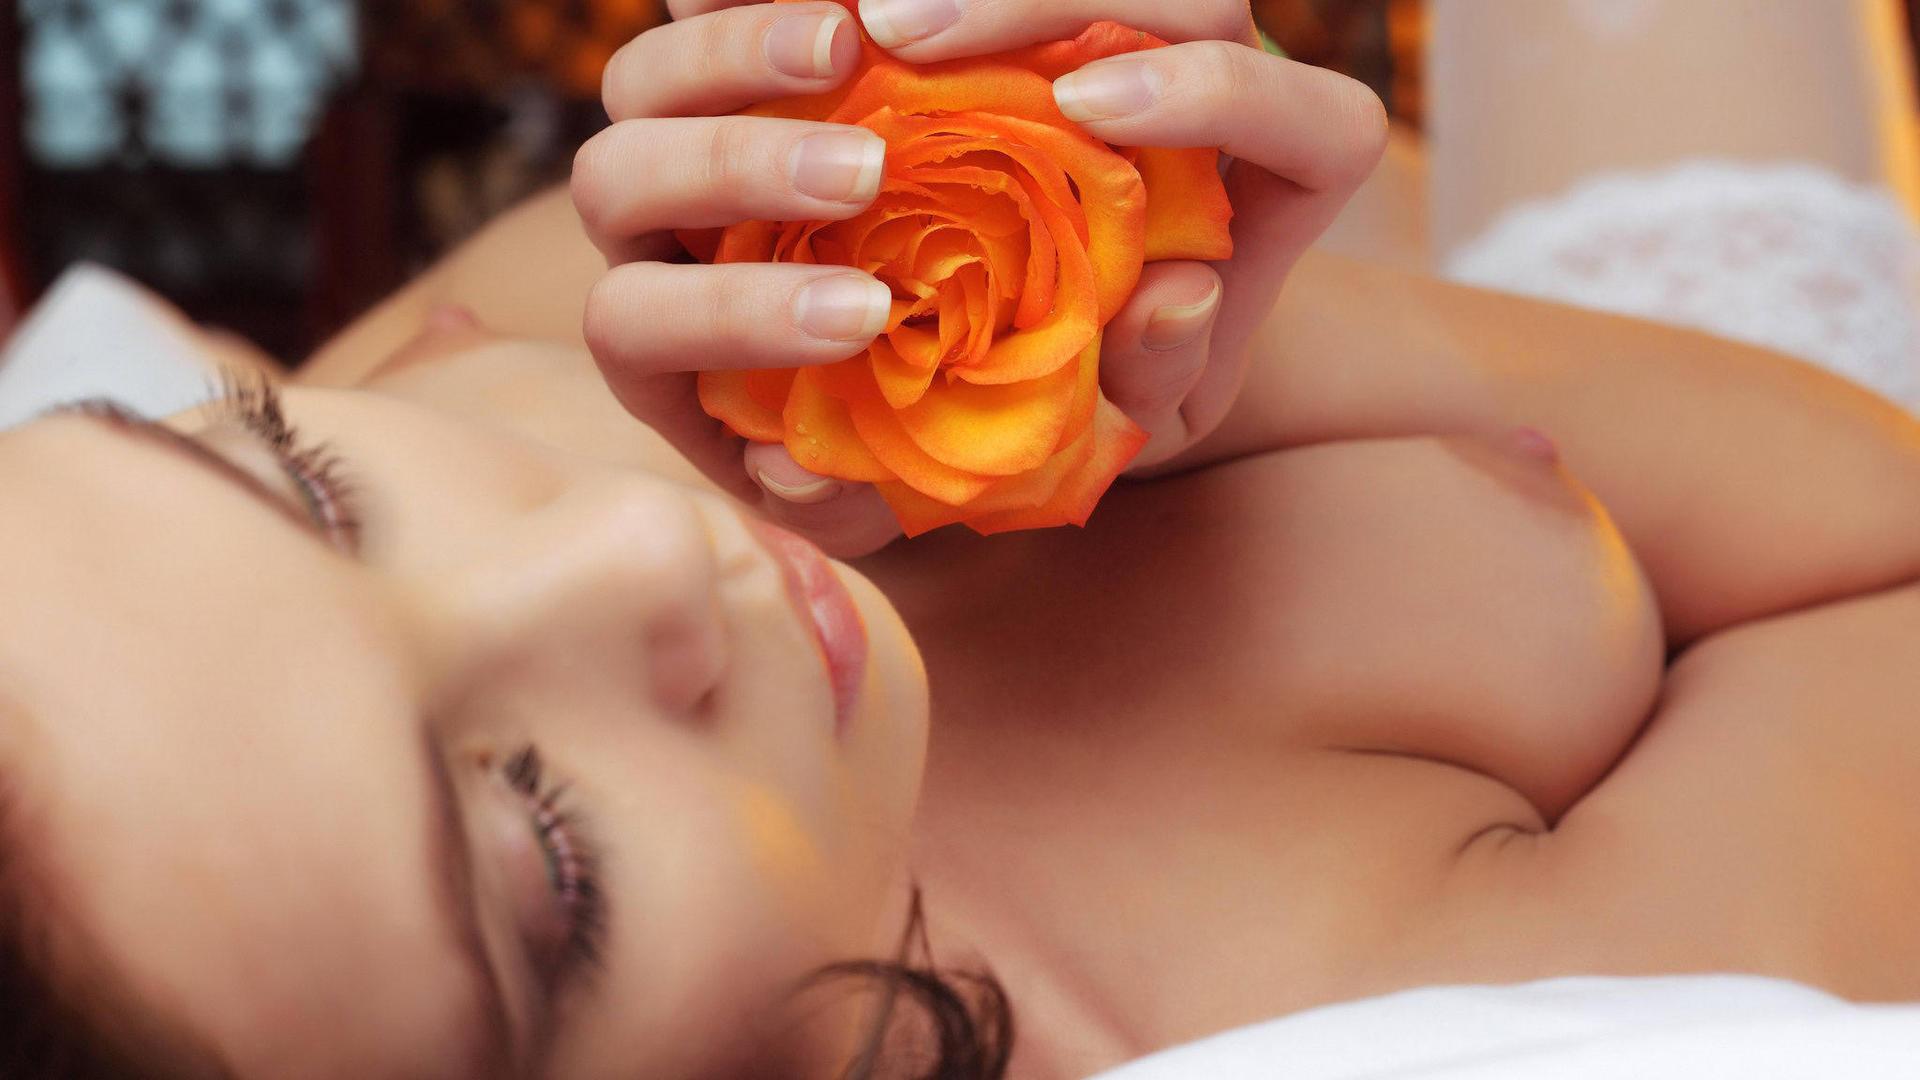 Экстрим анал девушки розы фото ню счастья онлайн кончили